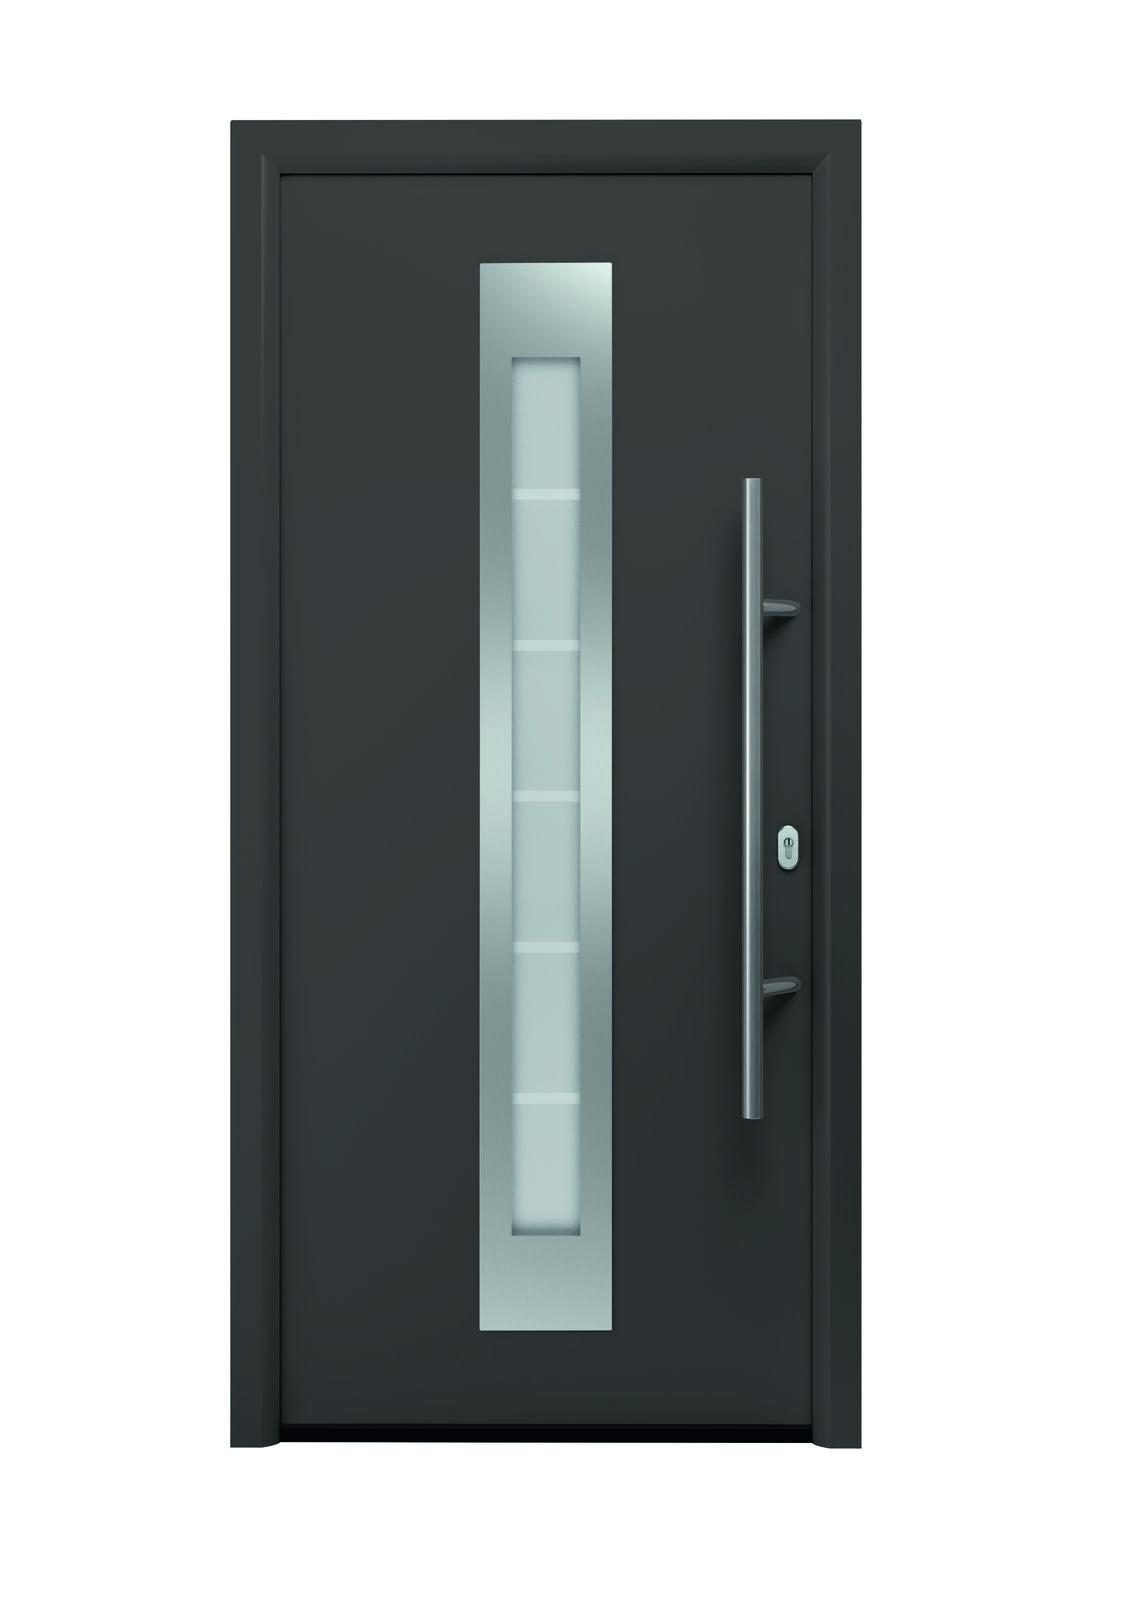 h rmann stahl aluminium haust r haust ren t r renodoor. Black Bedroom Furniture Sets. Home Design Ideas